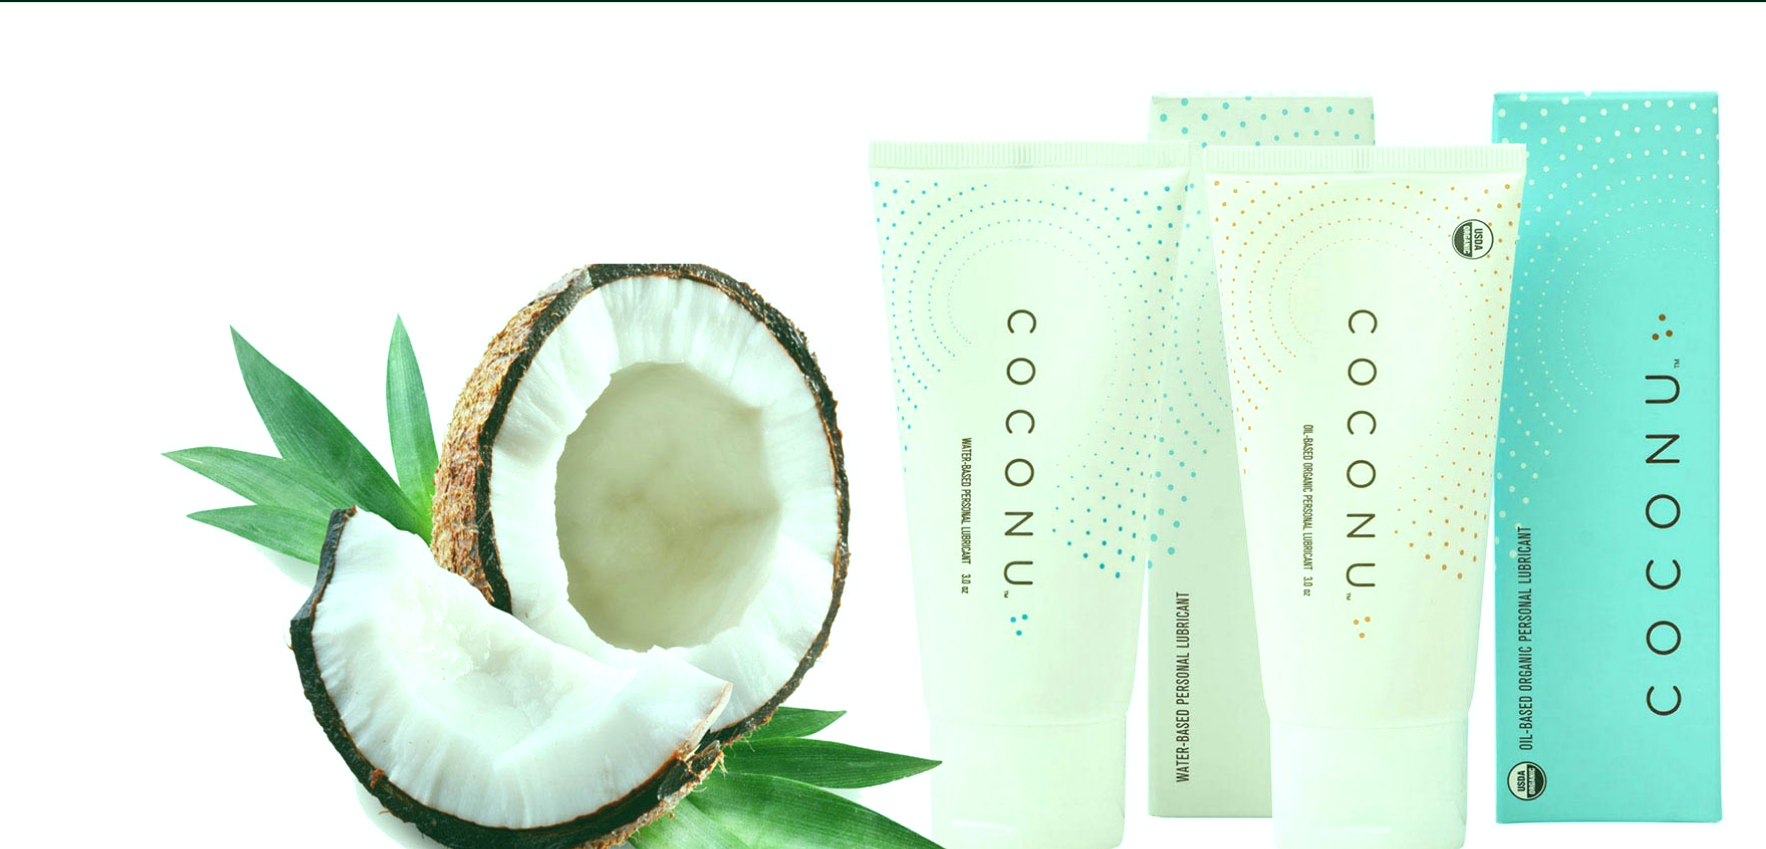 Lubricantes naturales a base de aceite de coco.